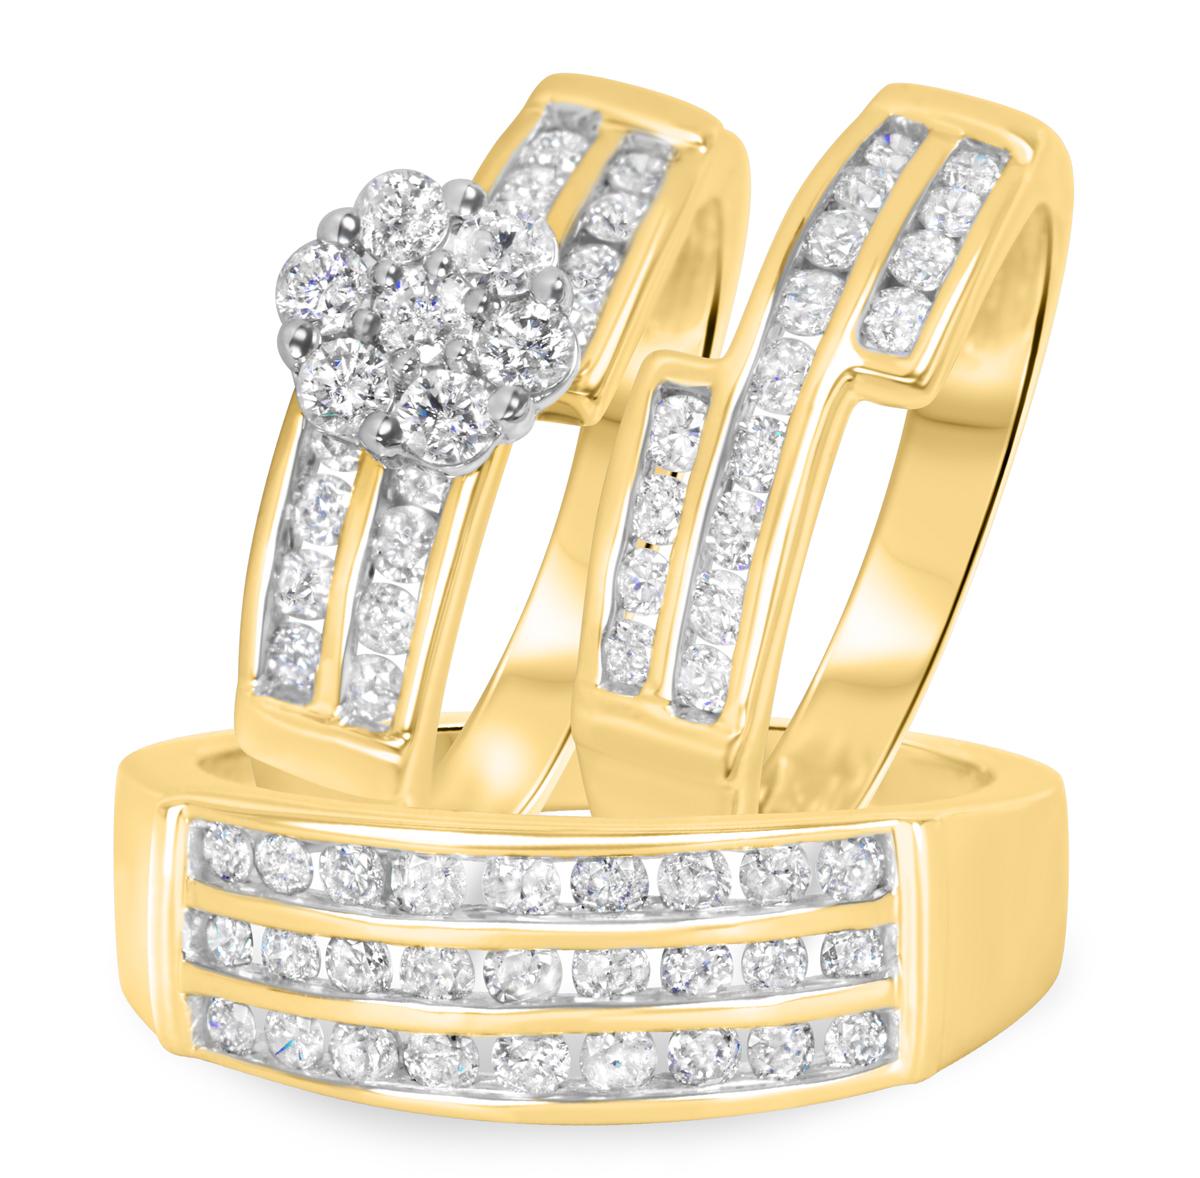 1 3/4 Carat T.W. Round Cut Diamond Women's Engagement Ring, Ladies Wedding Band,